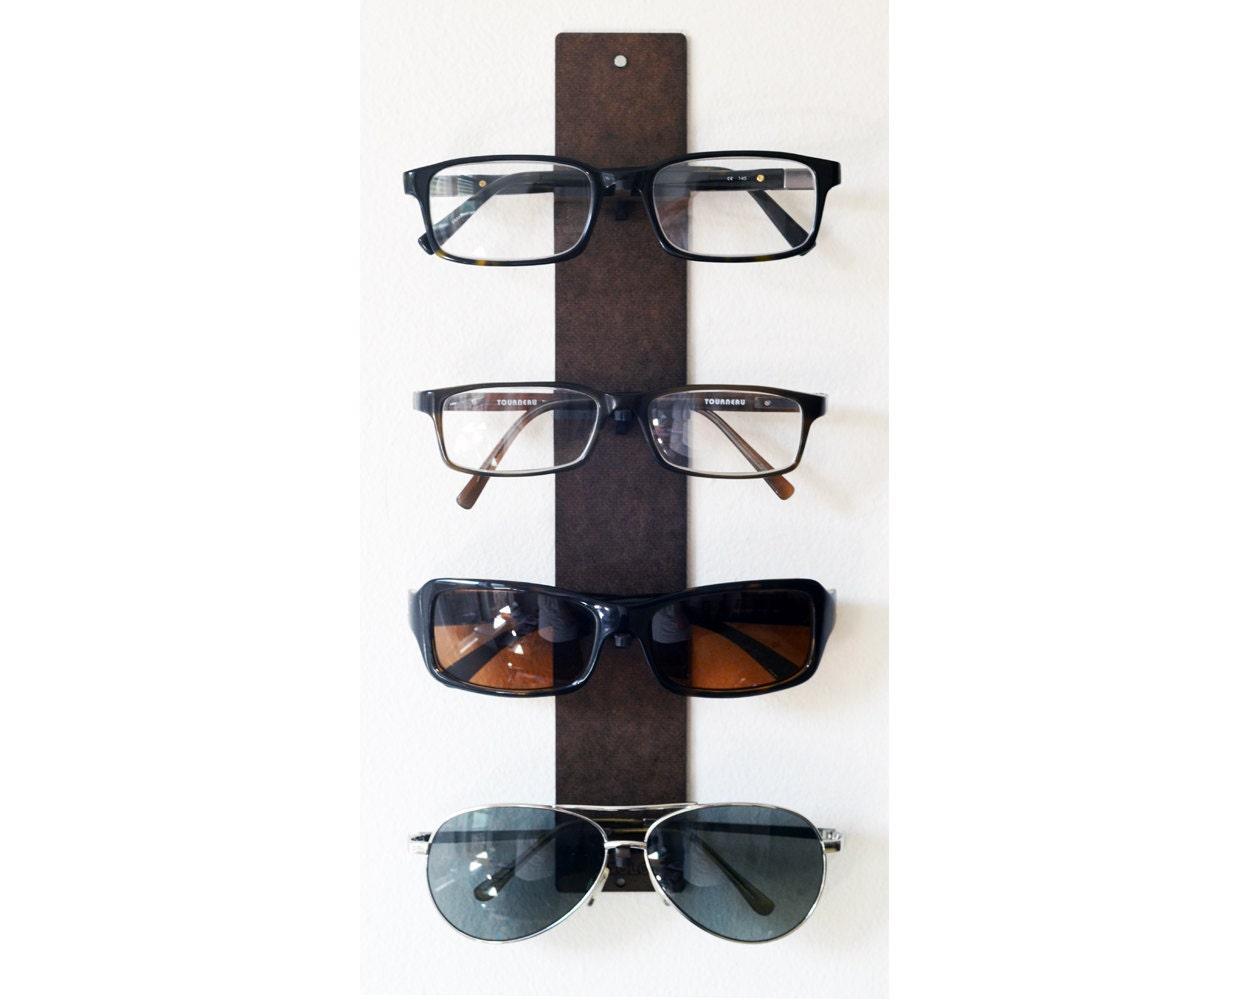 Eyeglasses display - Specs Shelf Eyewear Display Shelving And Organization